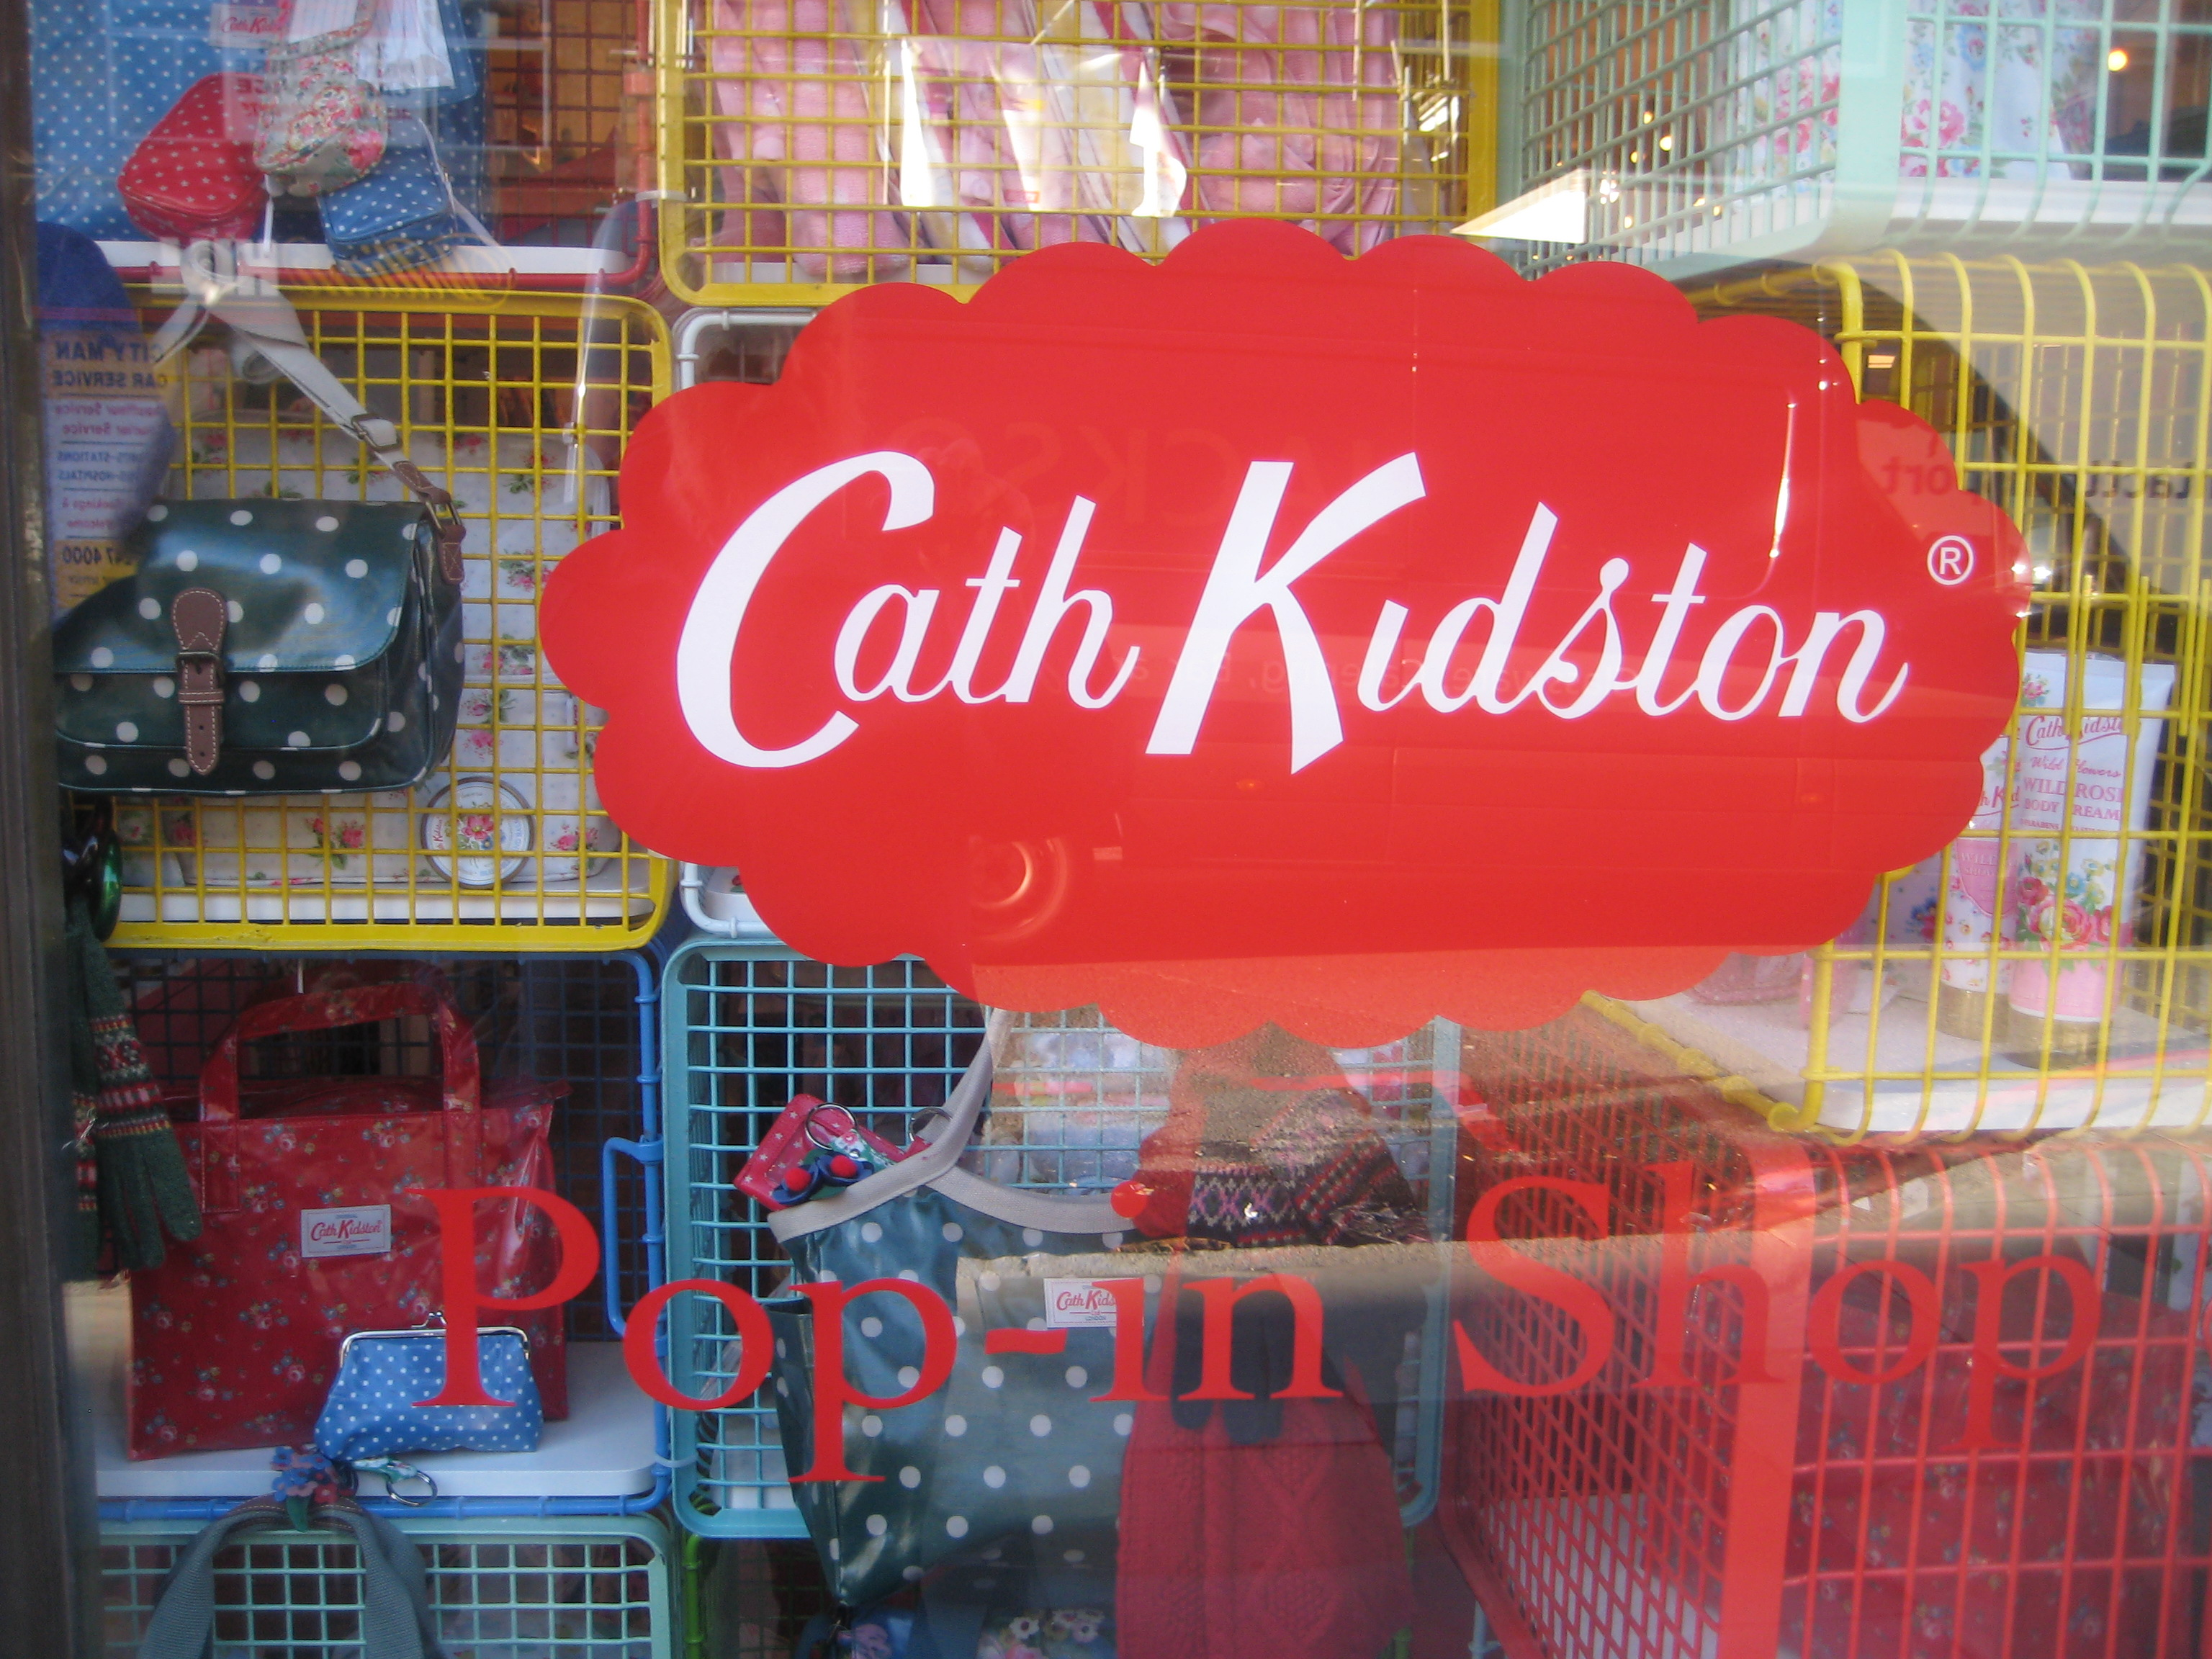 Cath Kidston Limited Wikipedia